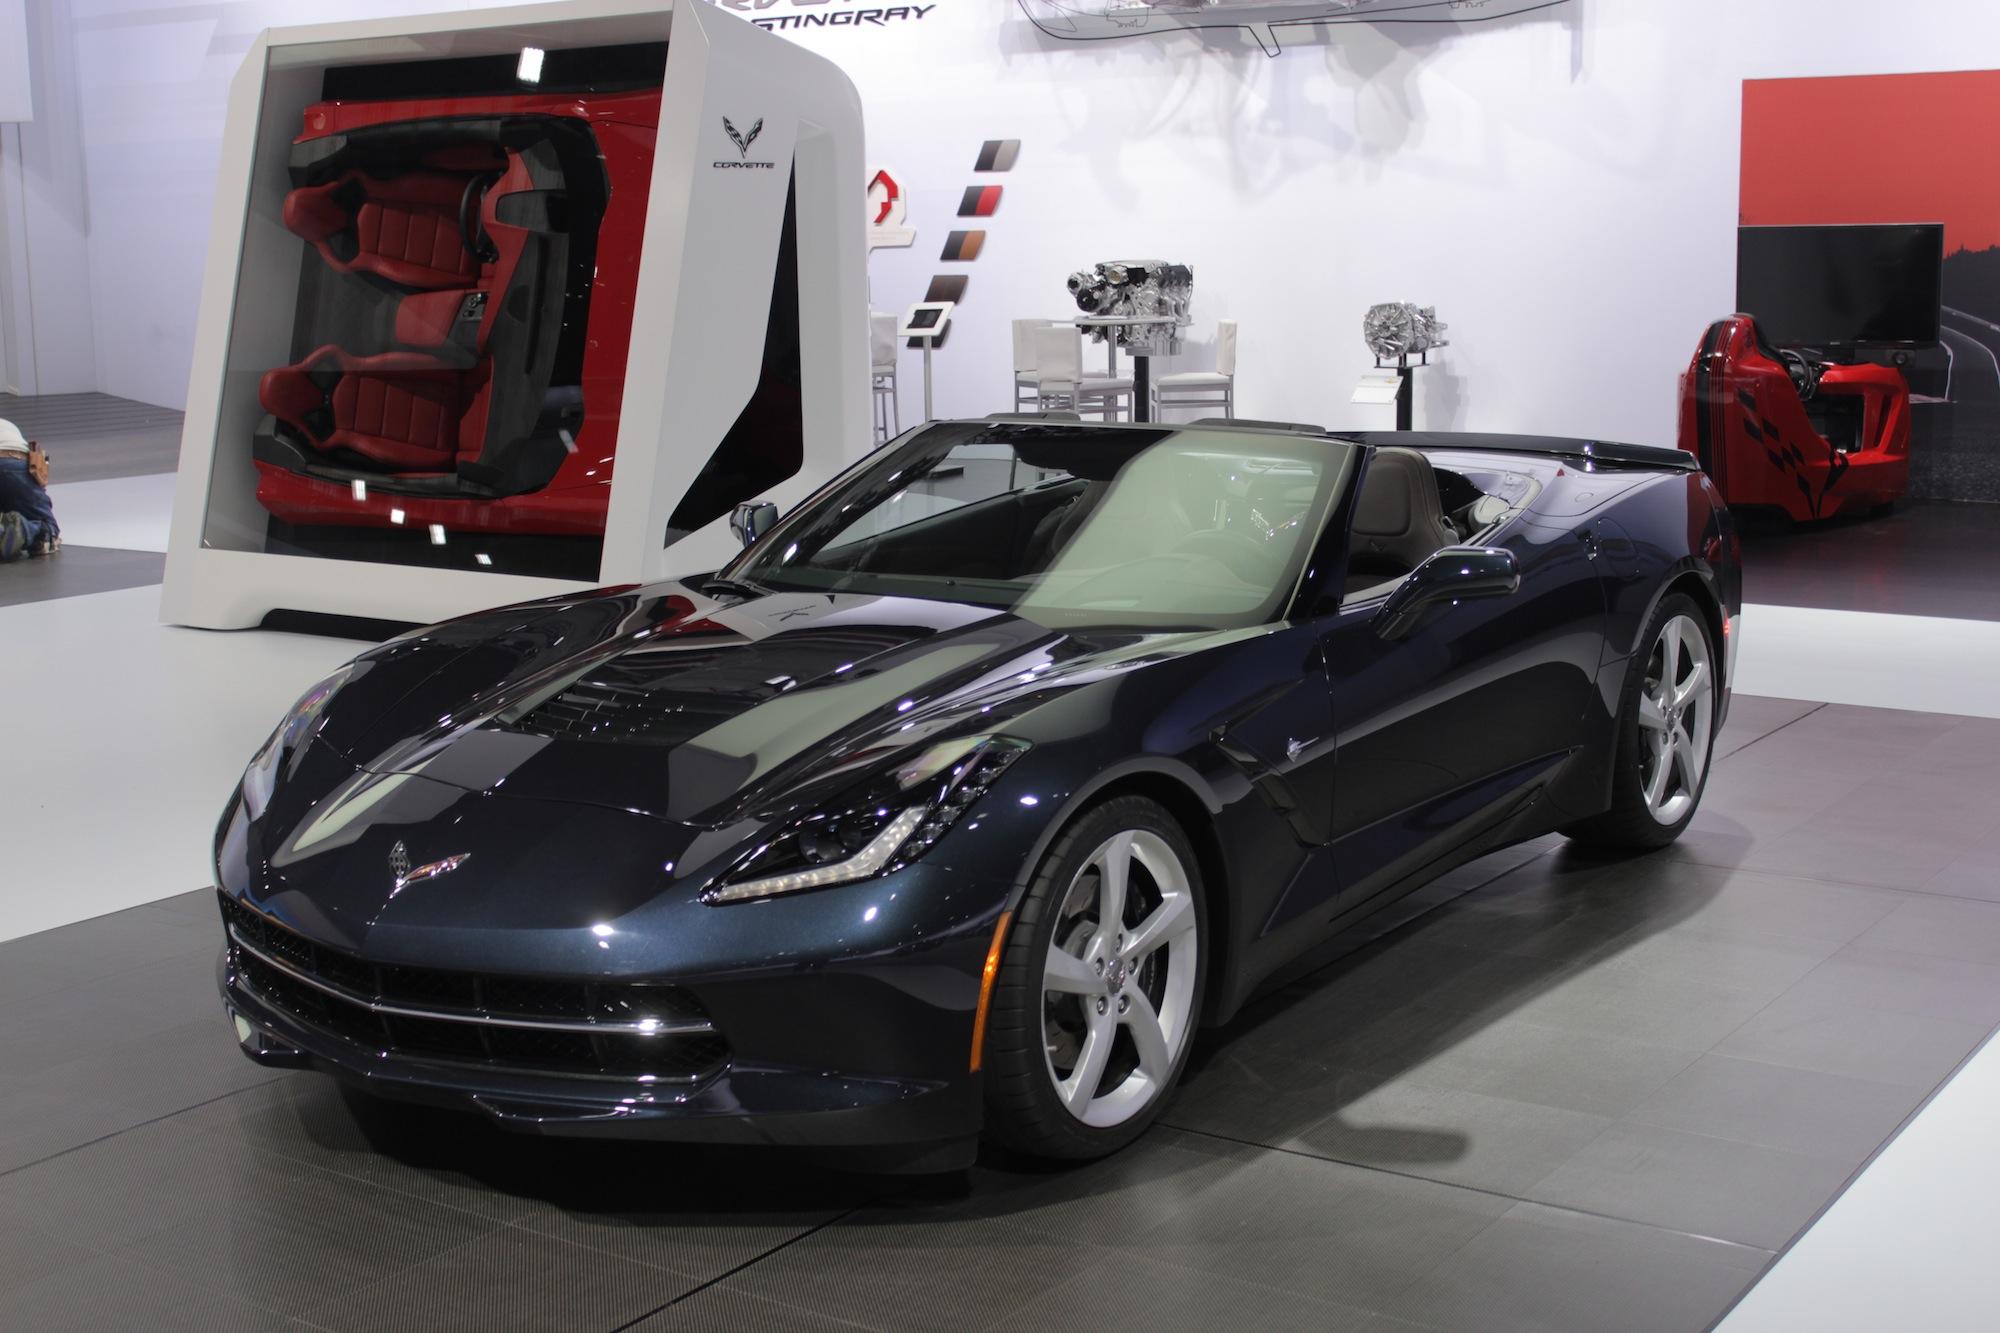 2014 chevrolet corvette stingray convertible video new york auto show - Corvette 2013 Stingray Interior